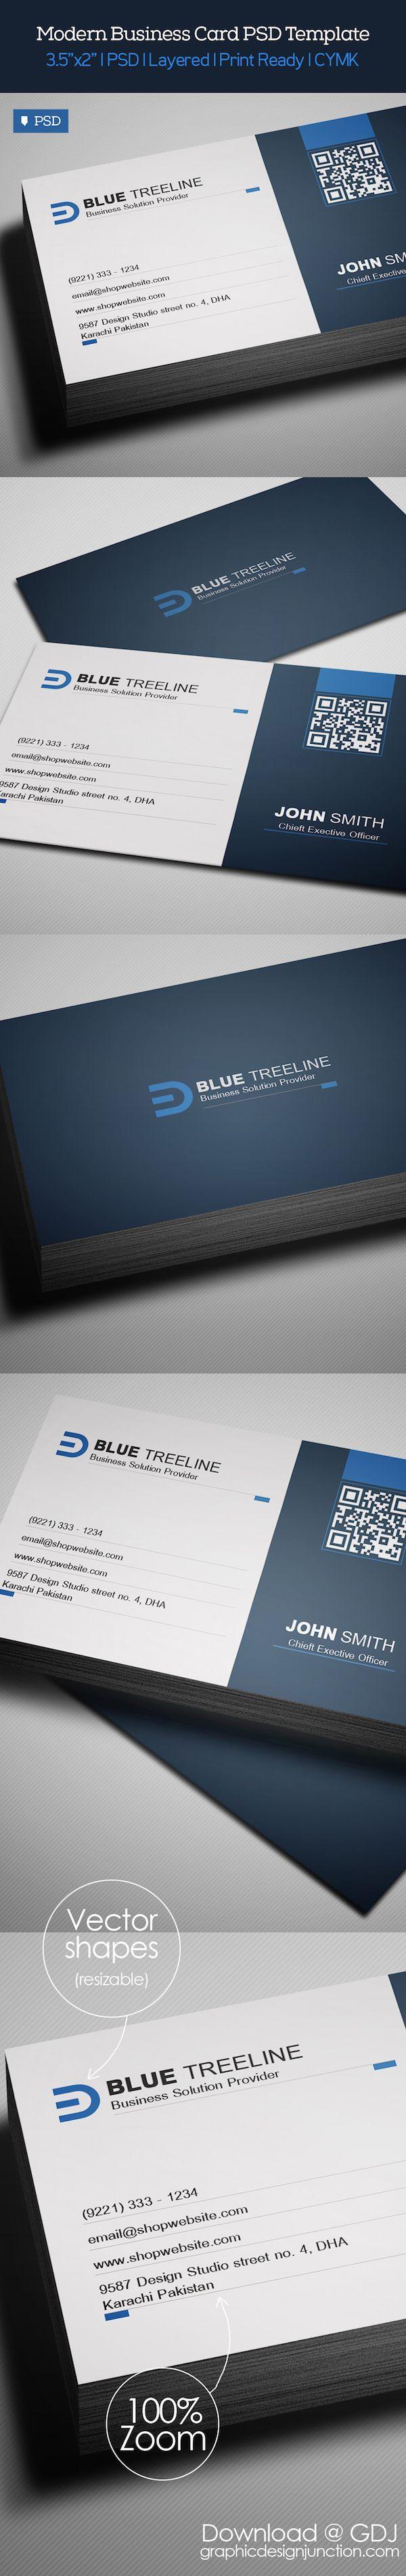 Free business card psd templates cohen davis pinterest free business card psd templates reheart Gallery